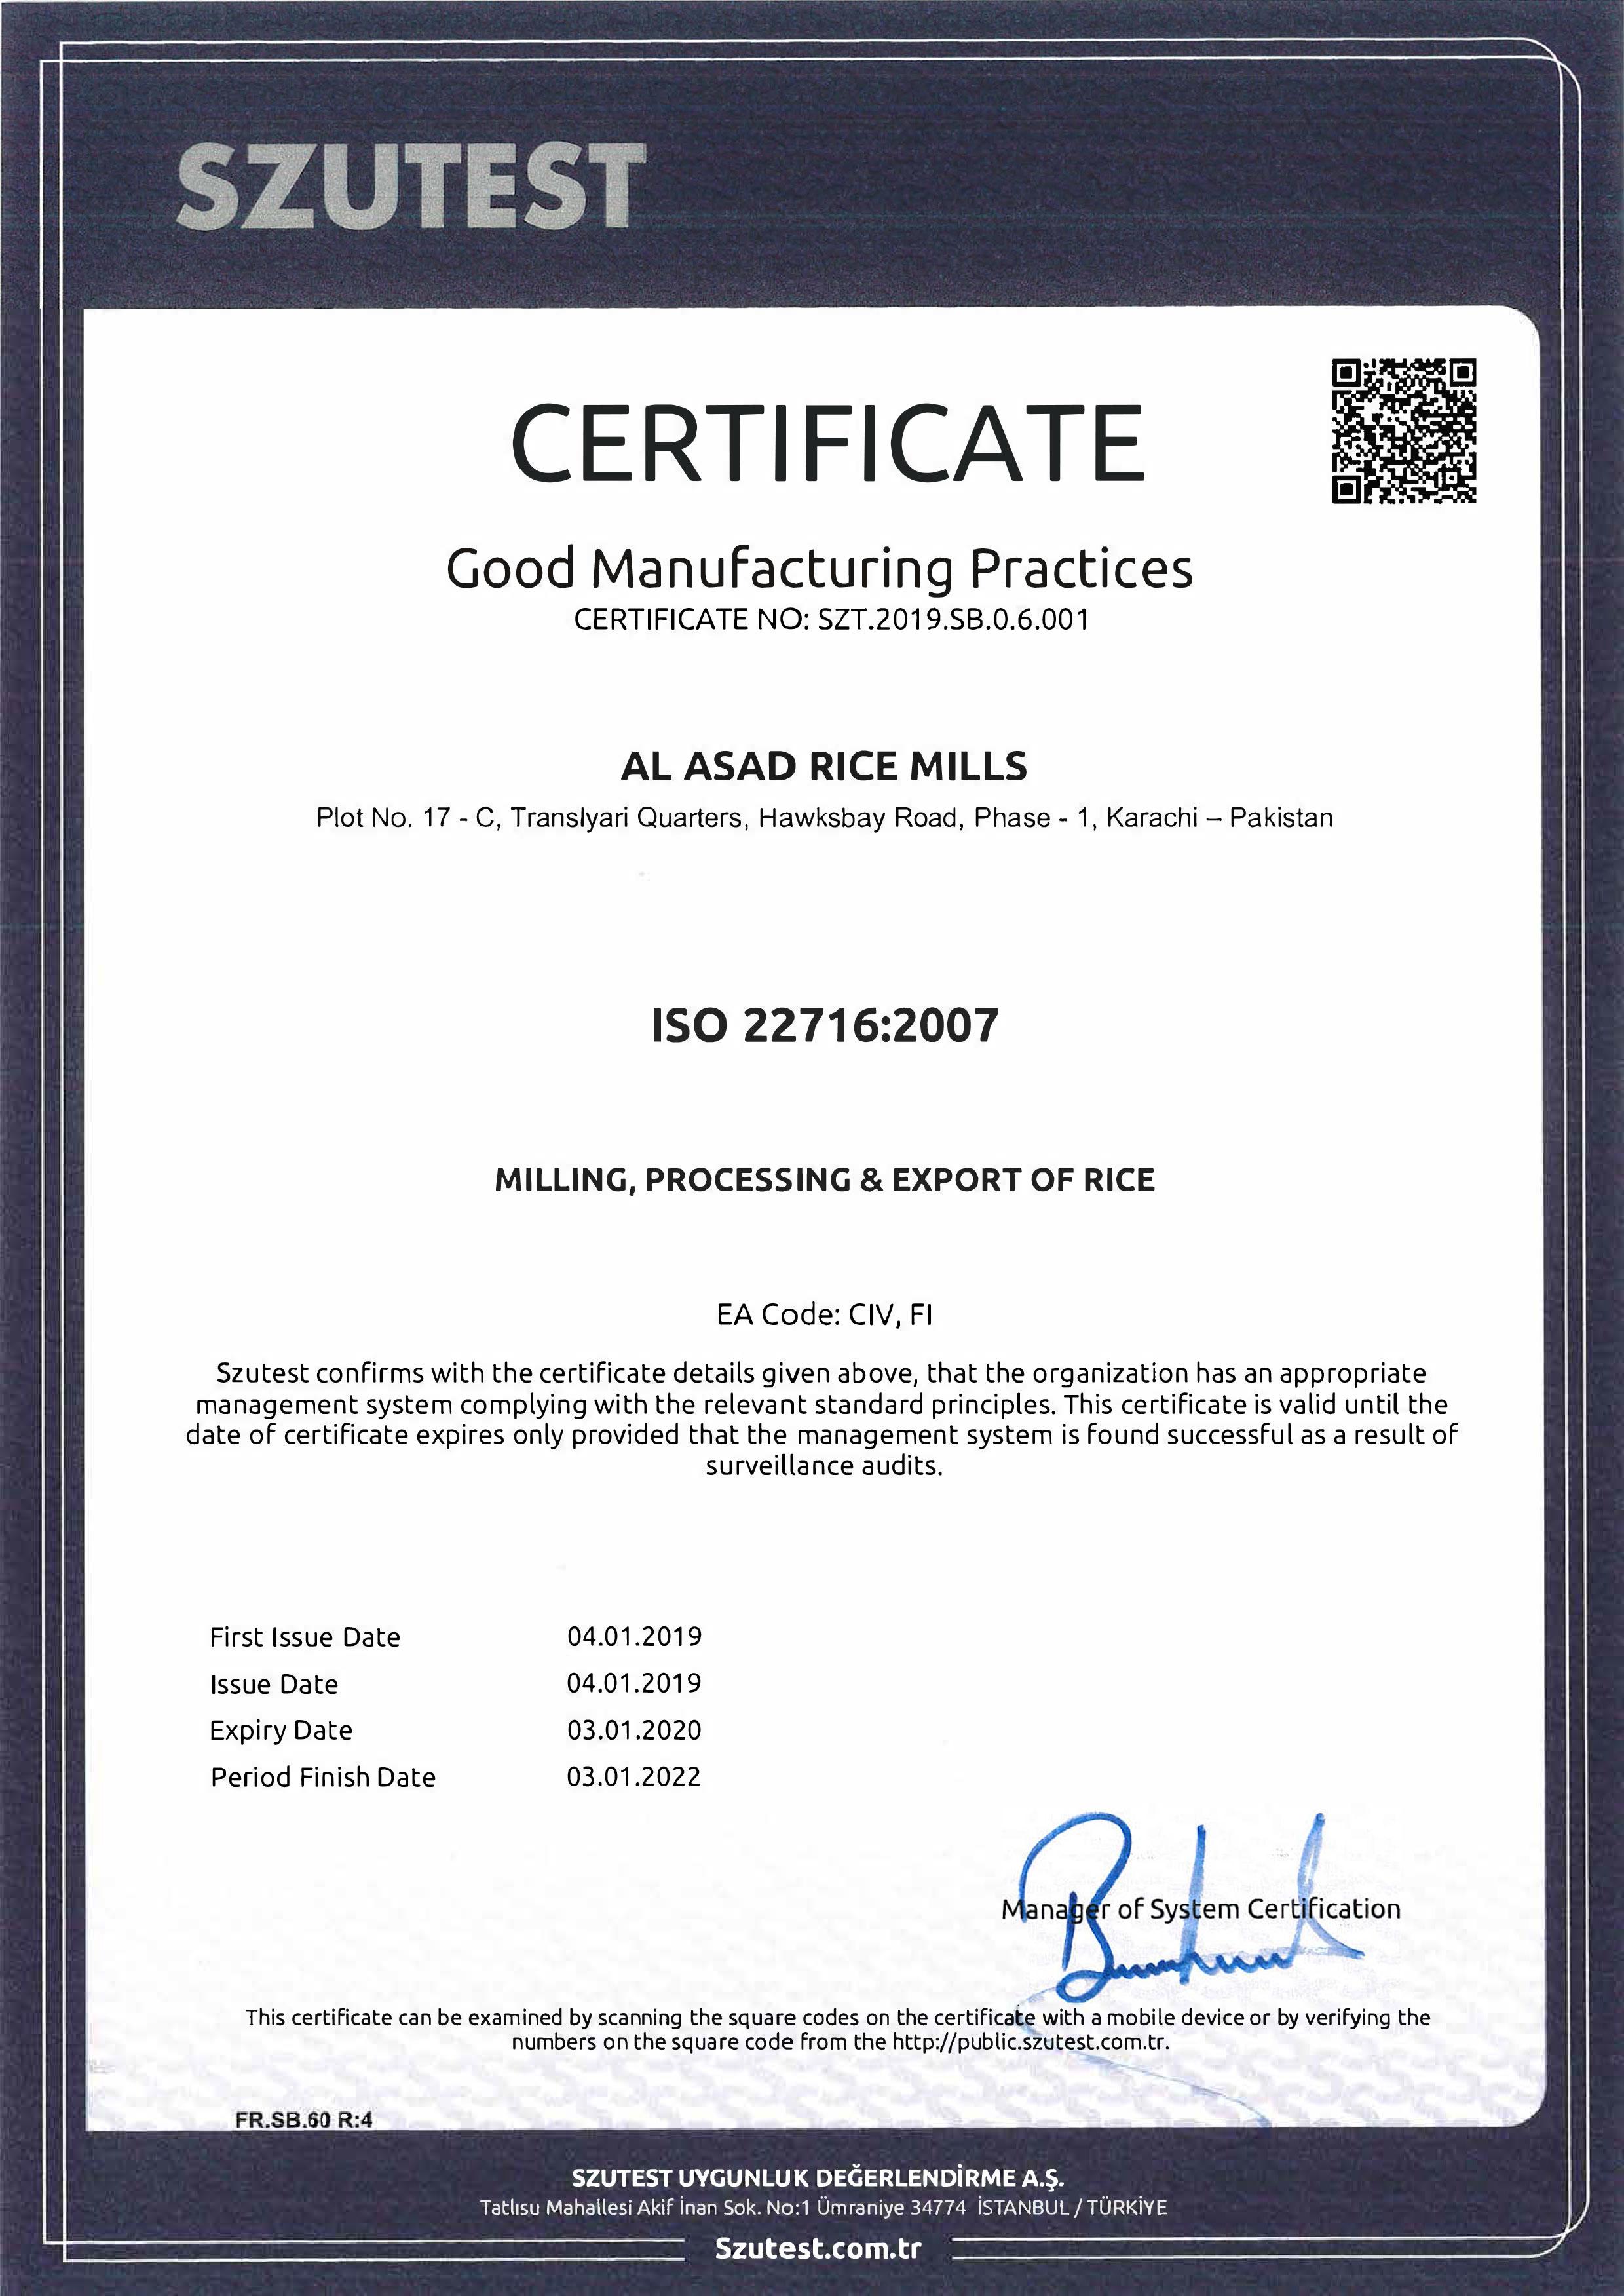 Company Profile – Al Asad Rice Mills